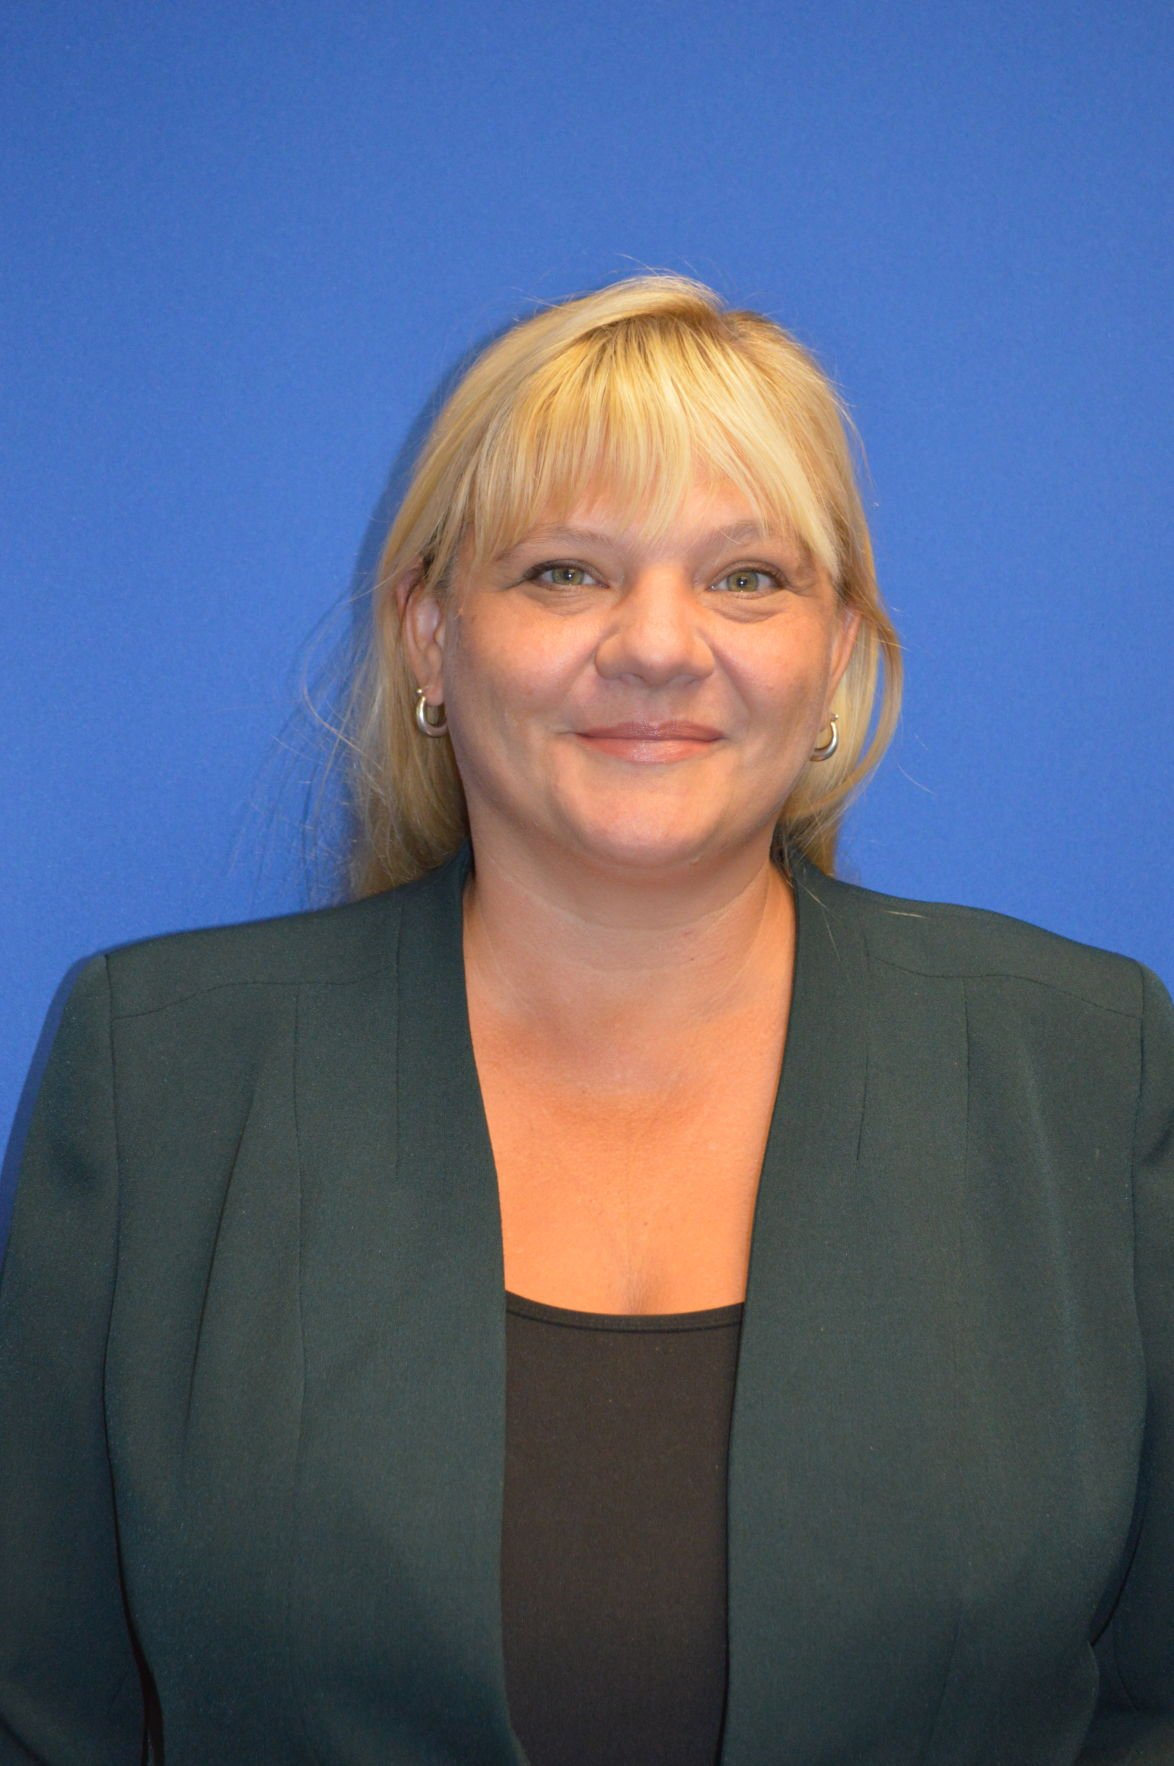 Dr. Anita Bowie headshot